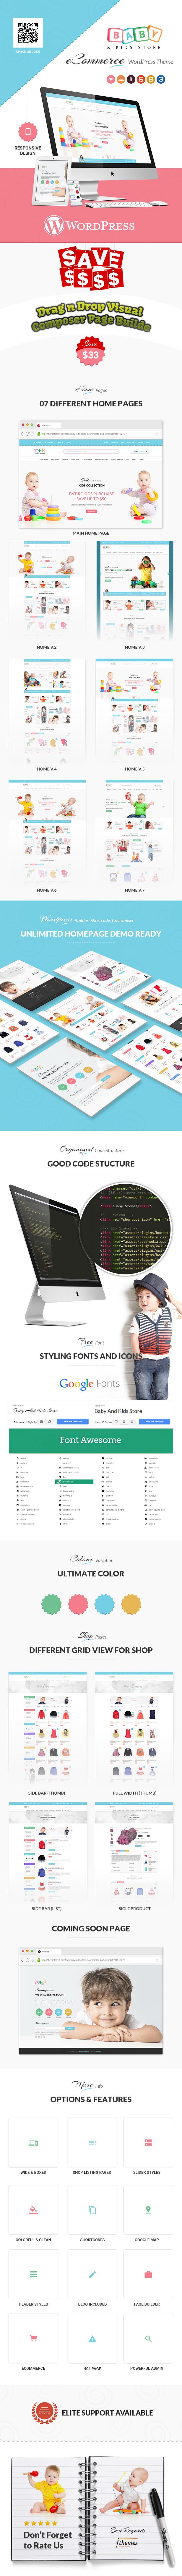 Baby & Kids Store eCommerce Woocommerce WordPress Theme - 3